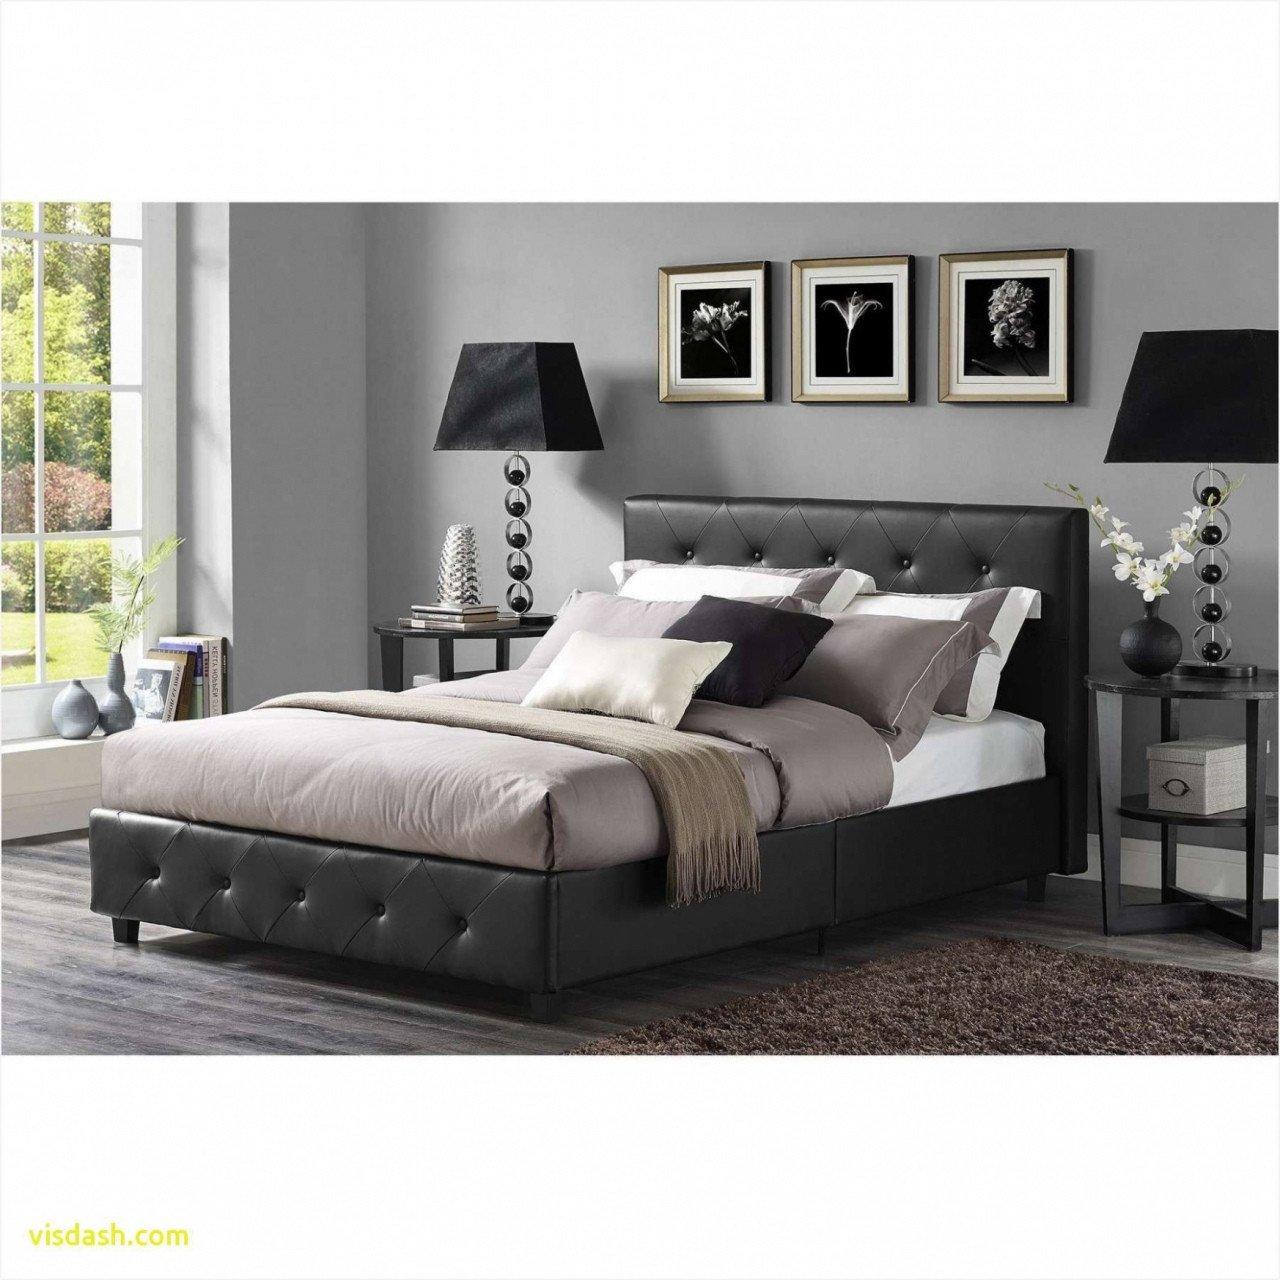 Full Bedroom Furniture Set Best Of Bedroom Sets Queen Loft Style Boho Elephant Bed In A Bag